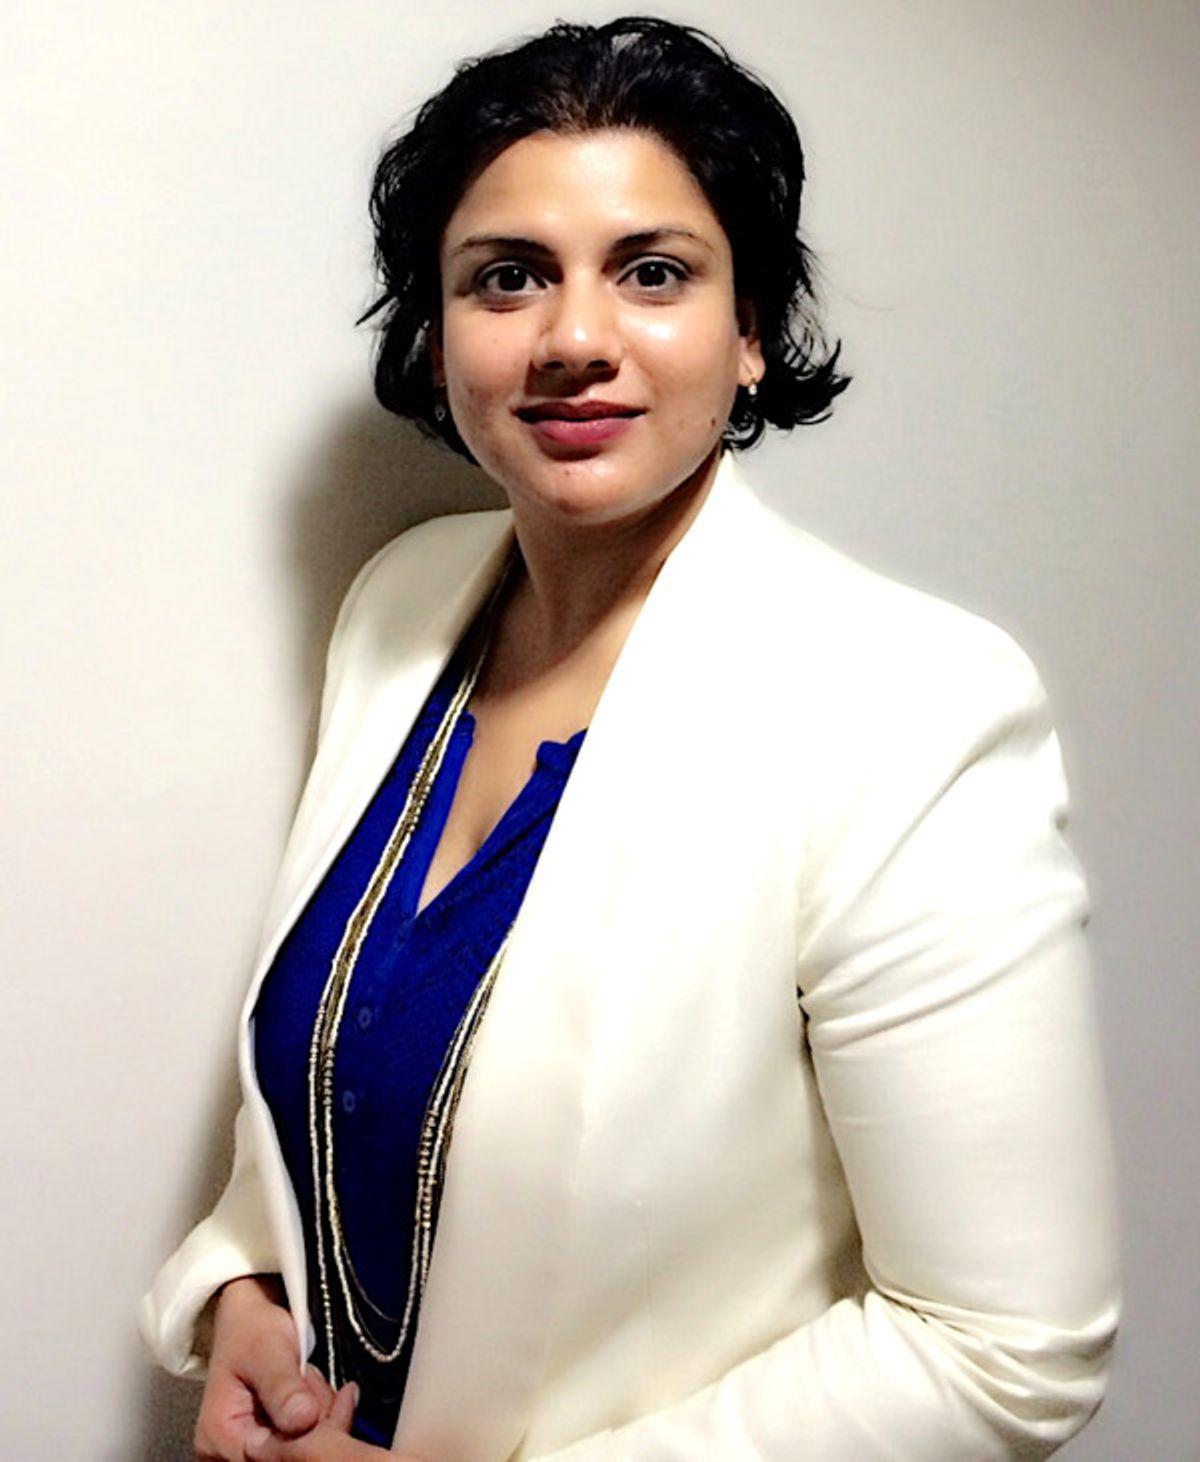 Photo of Dr Ruchi Dana, Venture Partner at FundRx